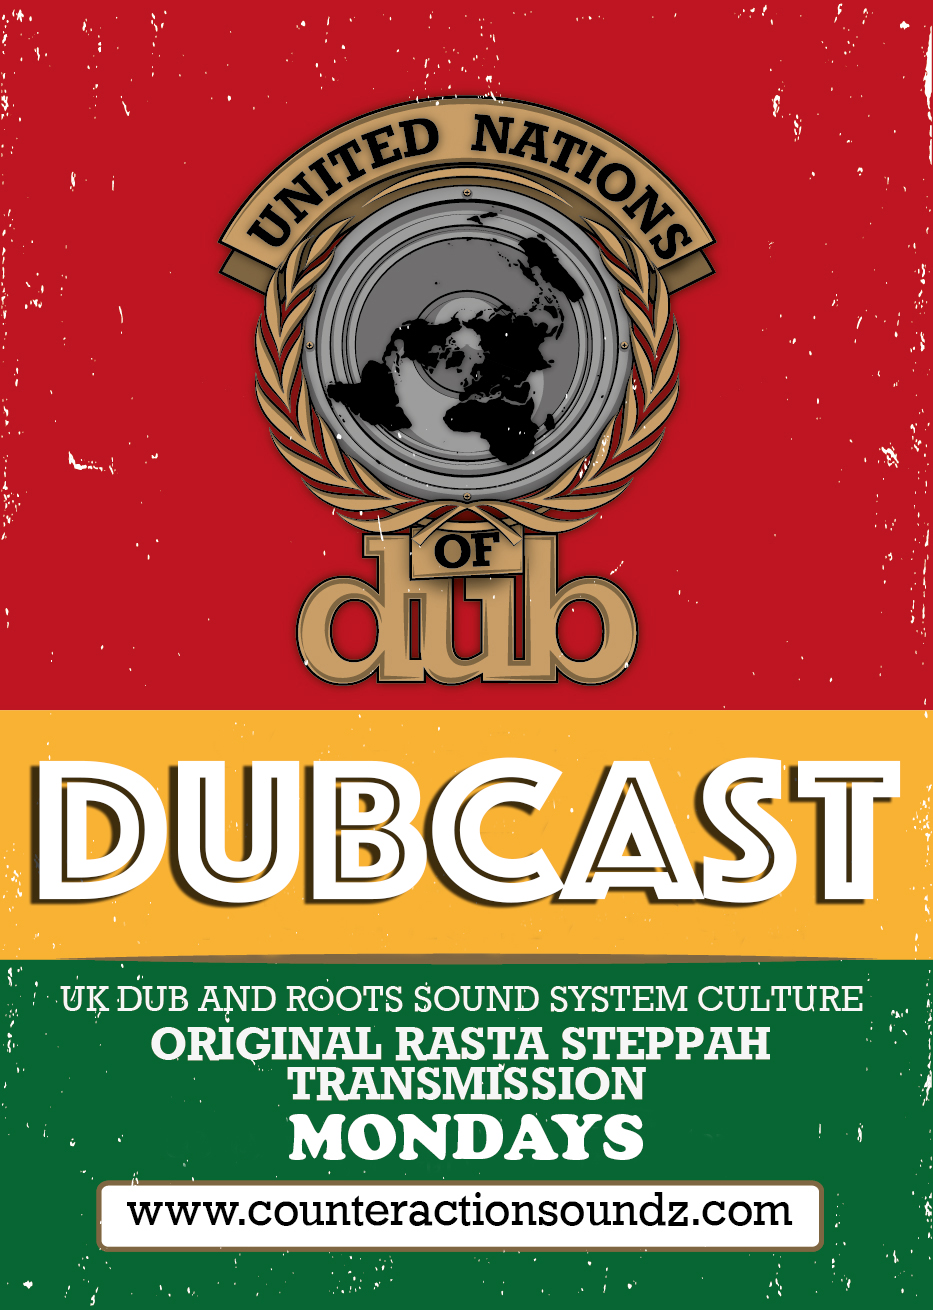 U.N.O.D. DUBcast label